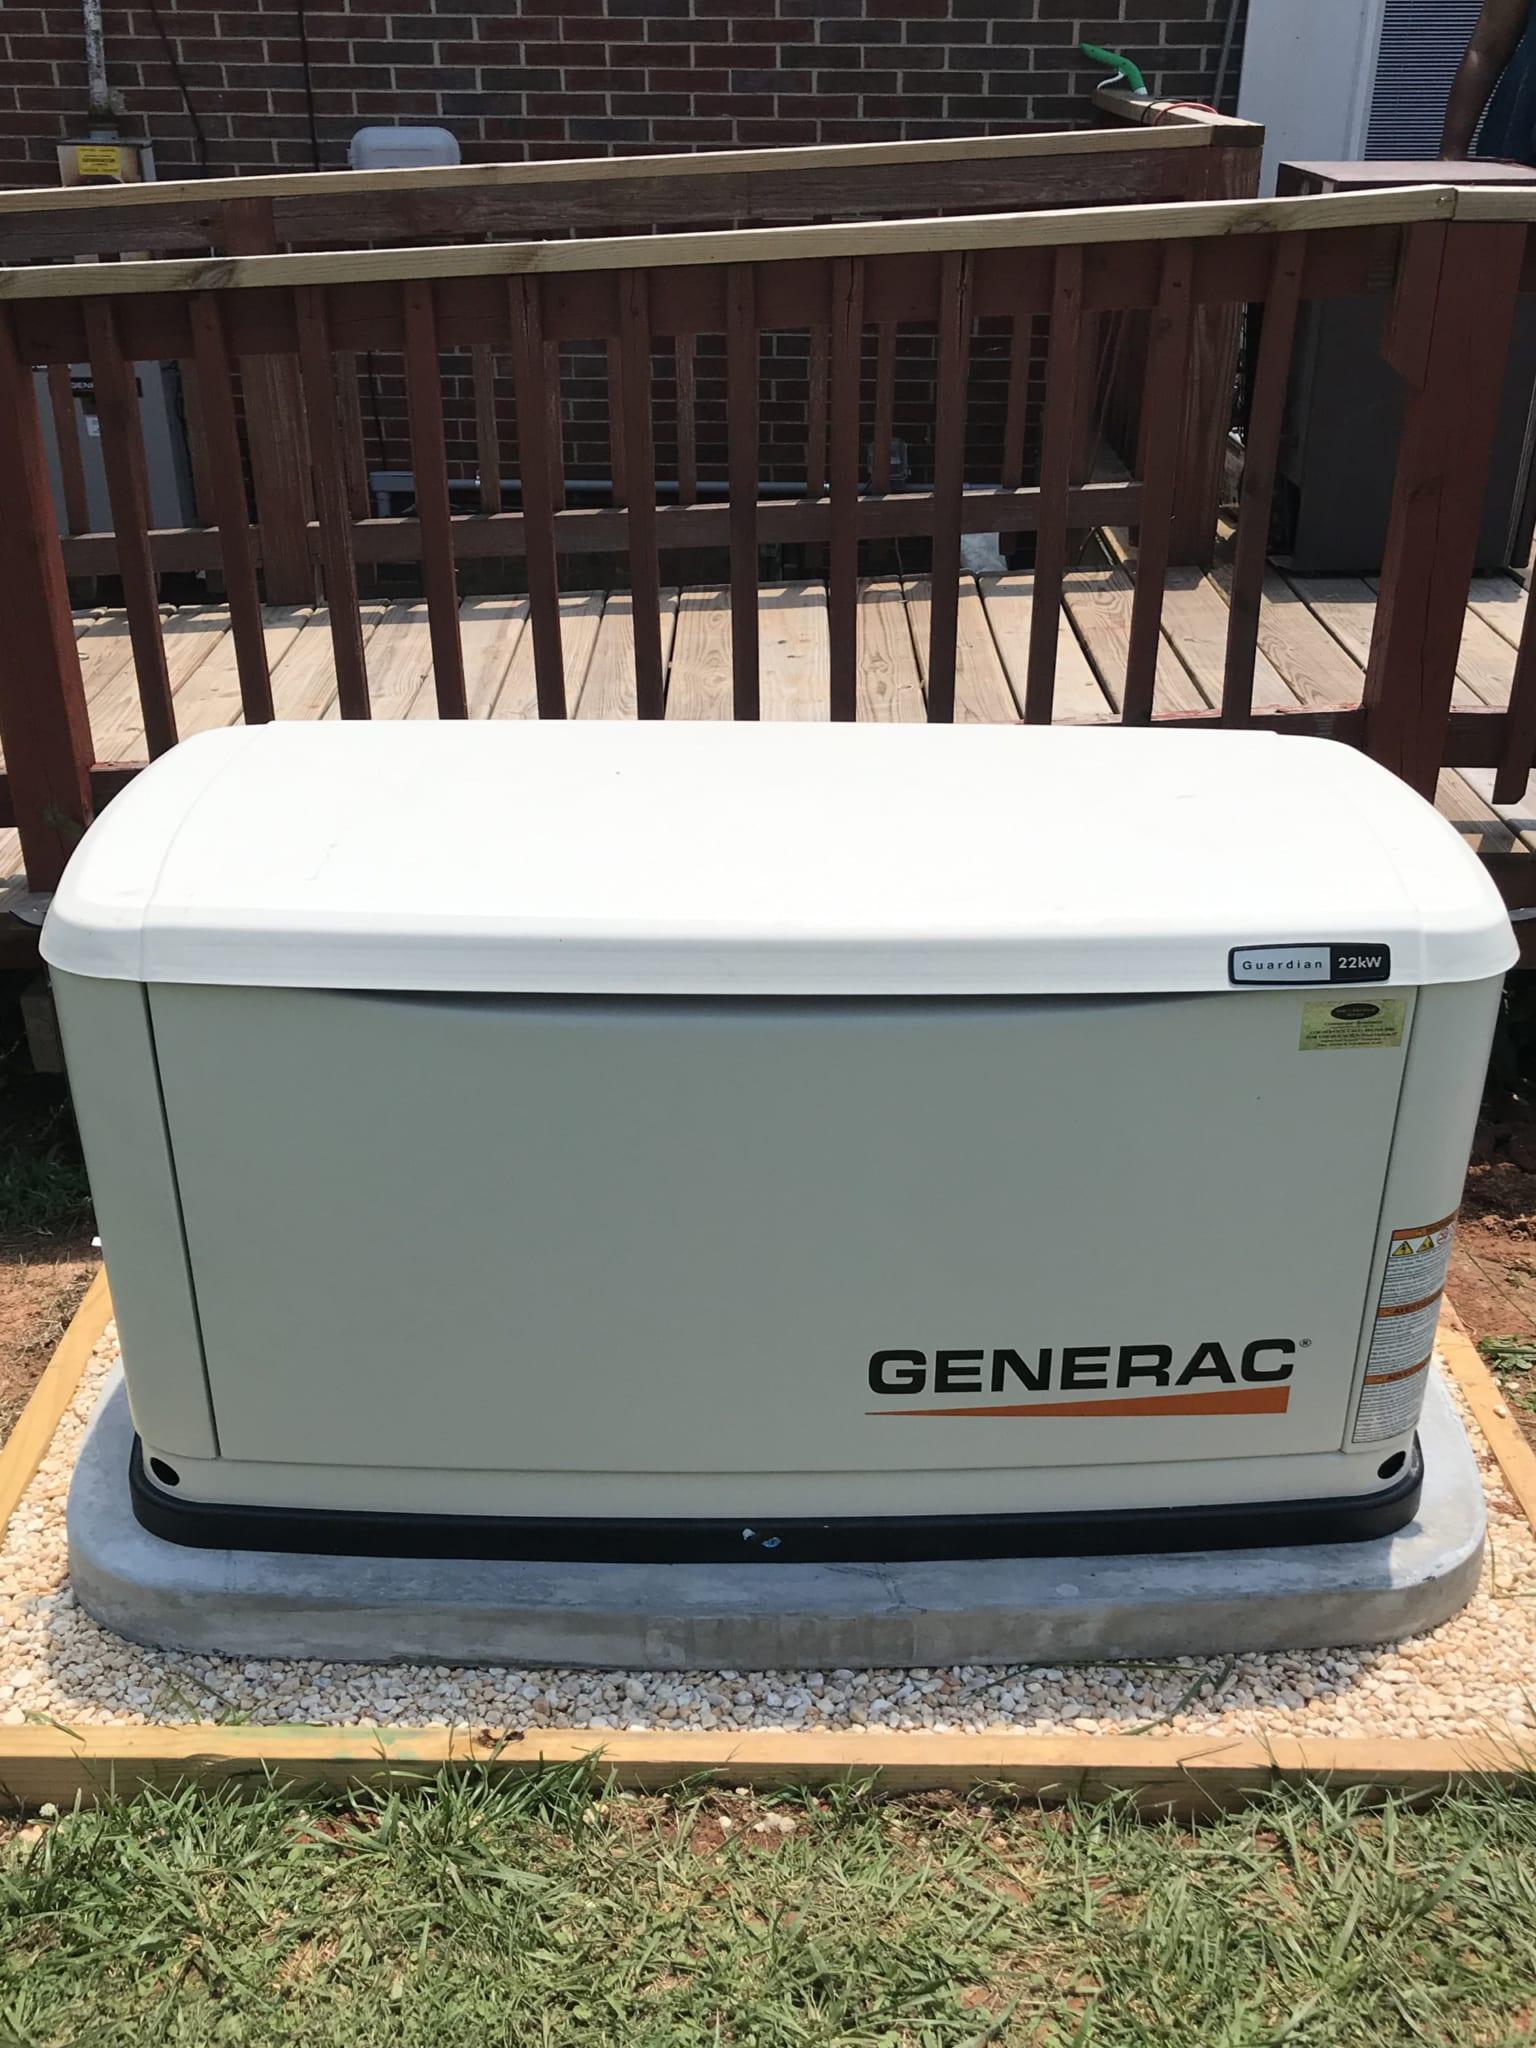 6.22.20 Mecklenburg Generac Automatic Standby Generator